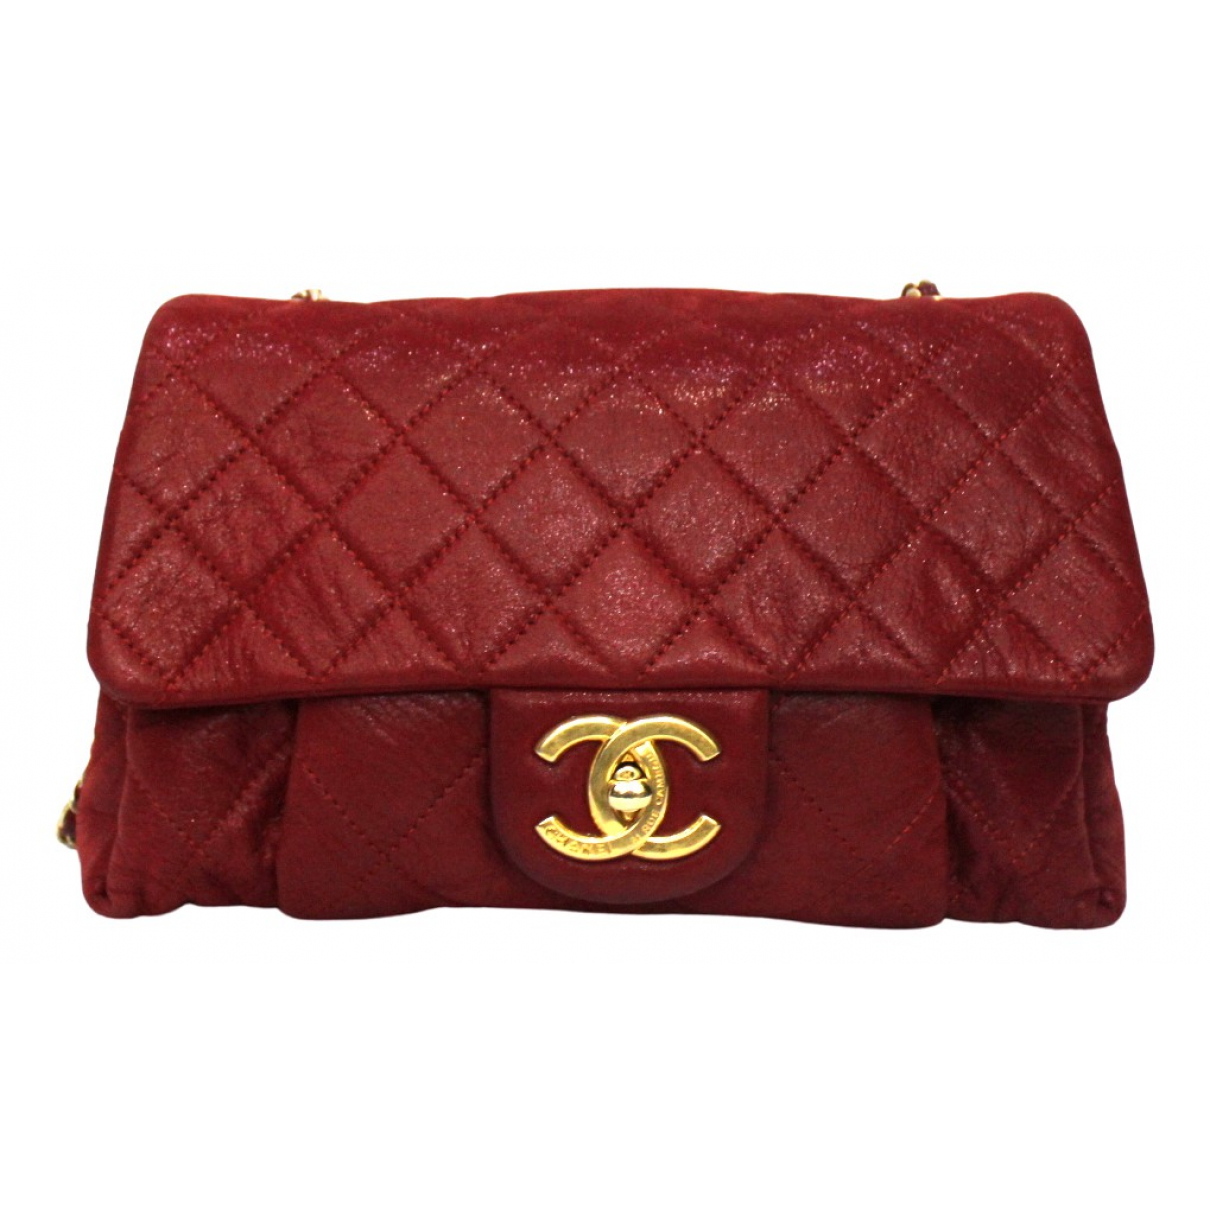 Chanel \N Red Leather handbag for Women \N